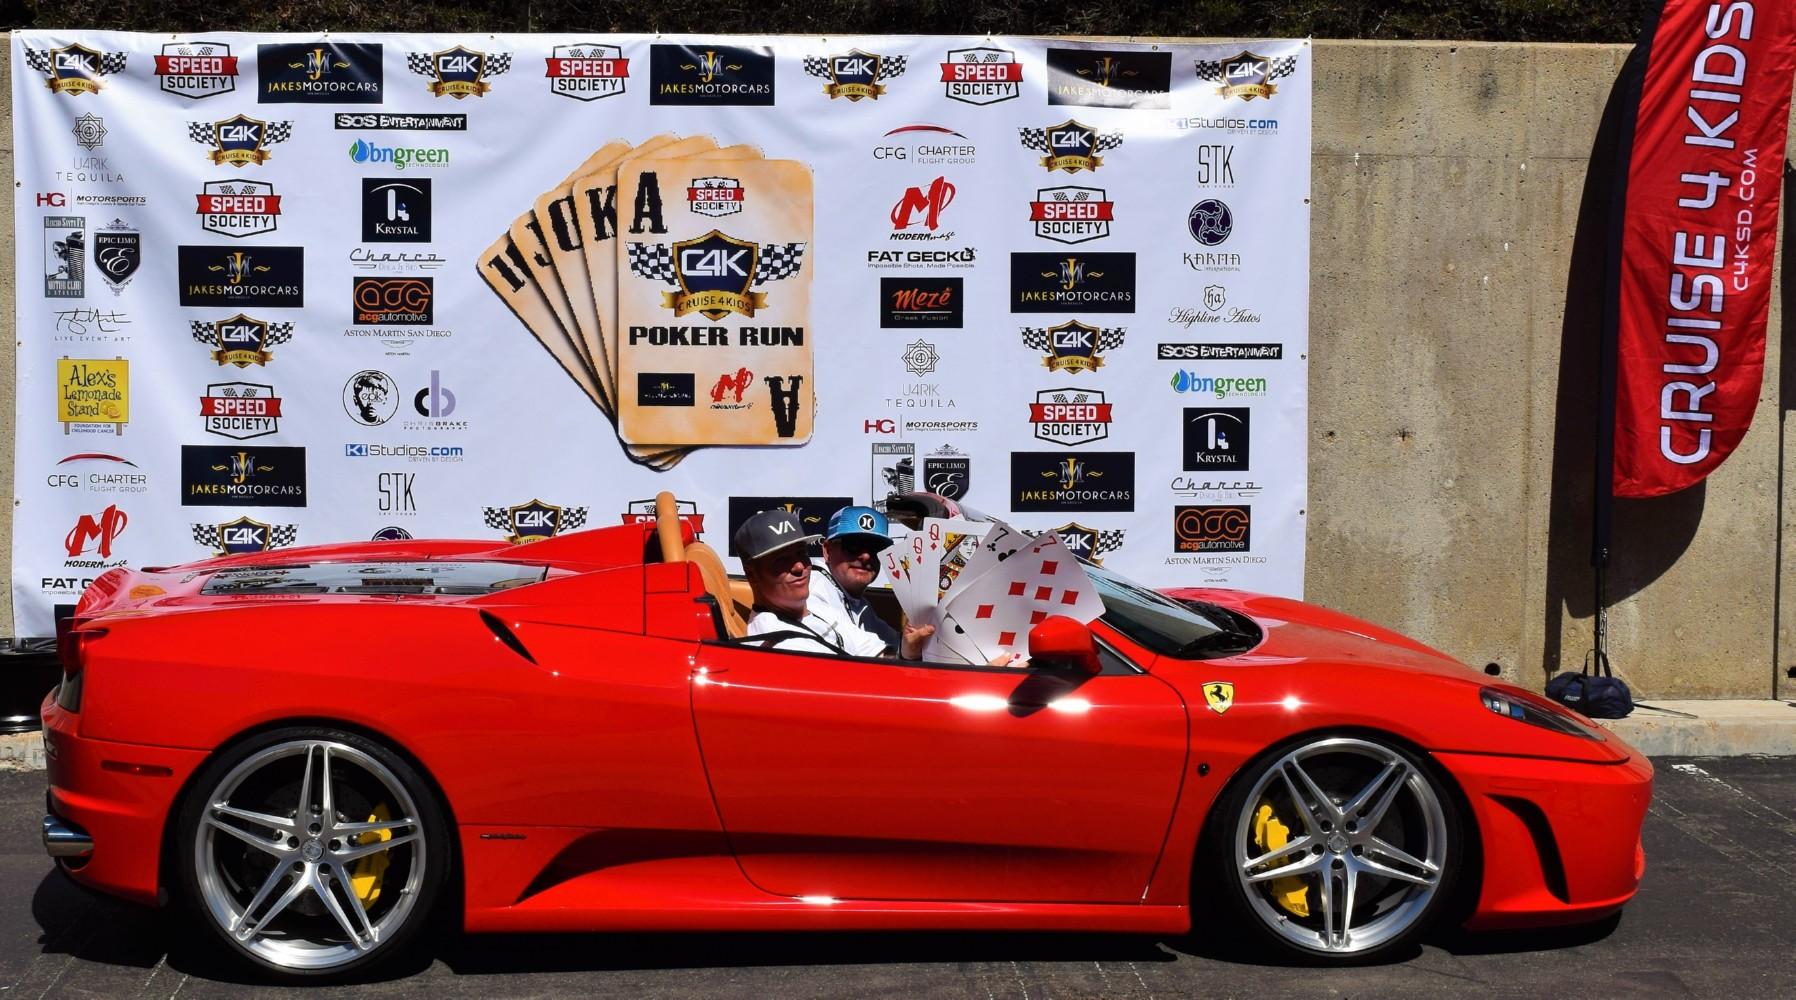 Poker Run 2017 Banner Photos - 15.jpg